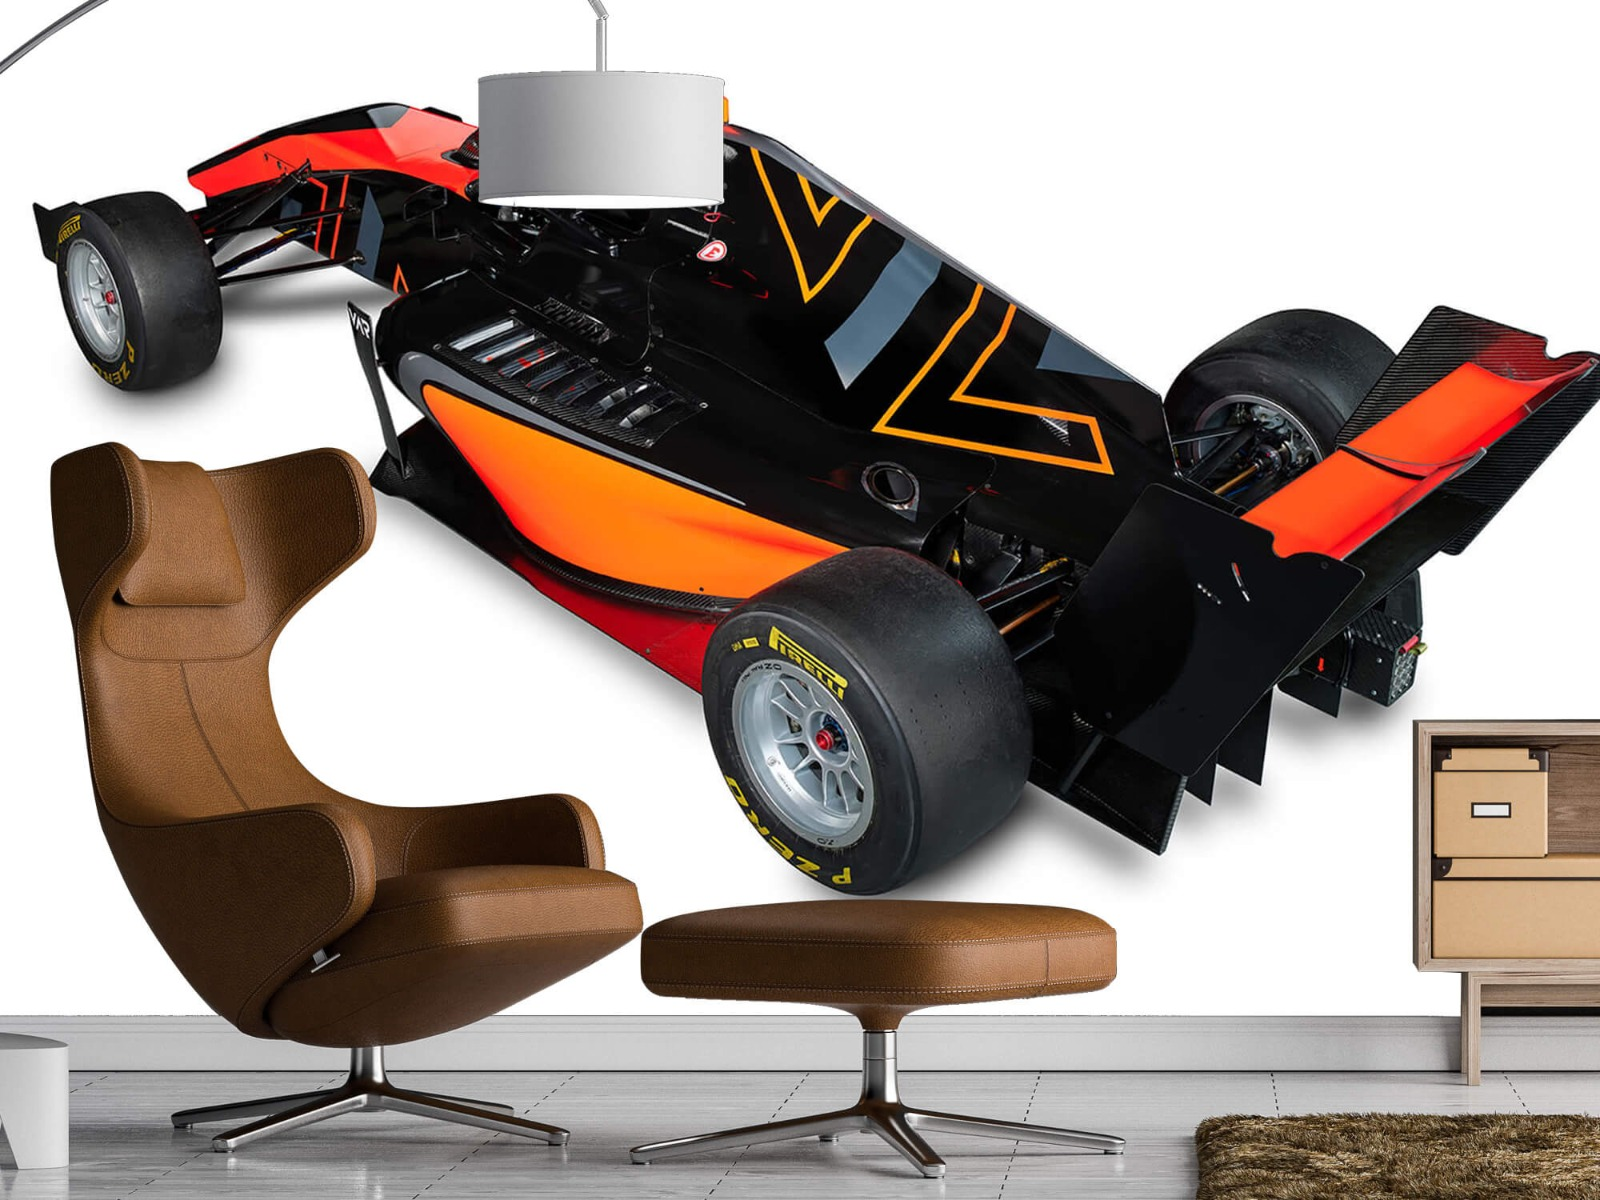 Sportauto's - Formula 3 - Rear left view - Hobbykamer 19